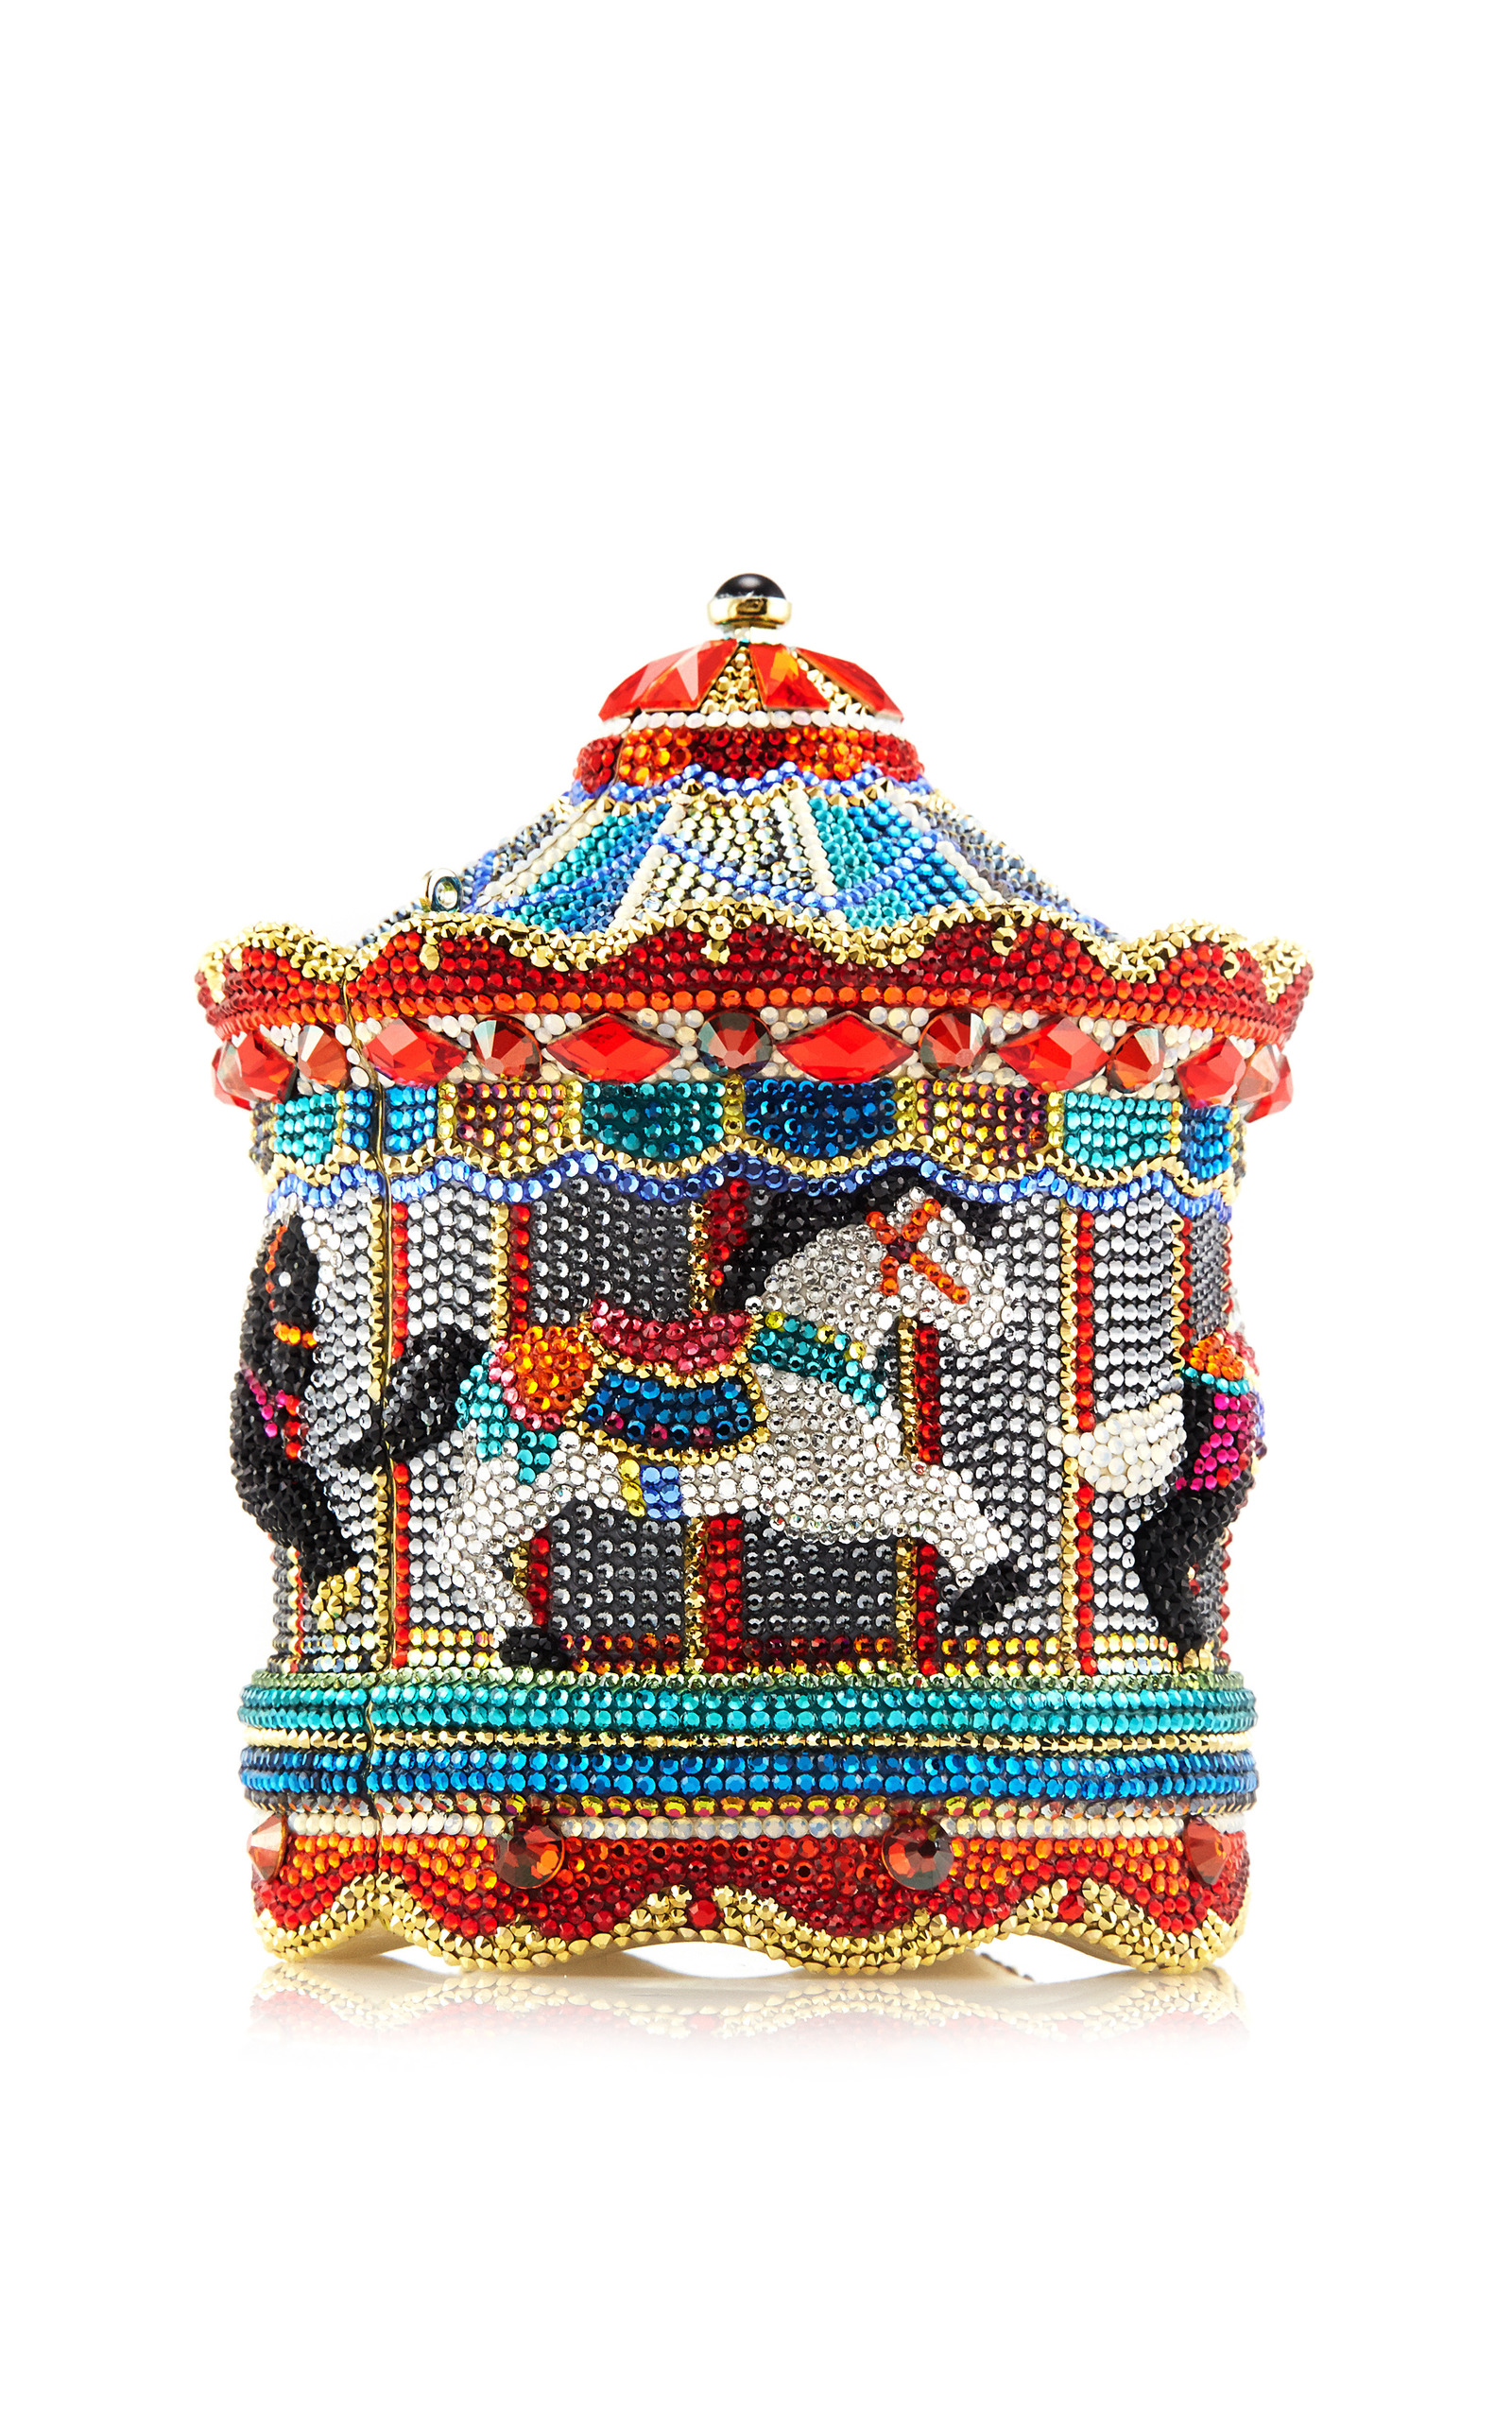 judith leiber carousel evening bag by judith leiber